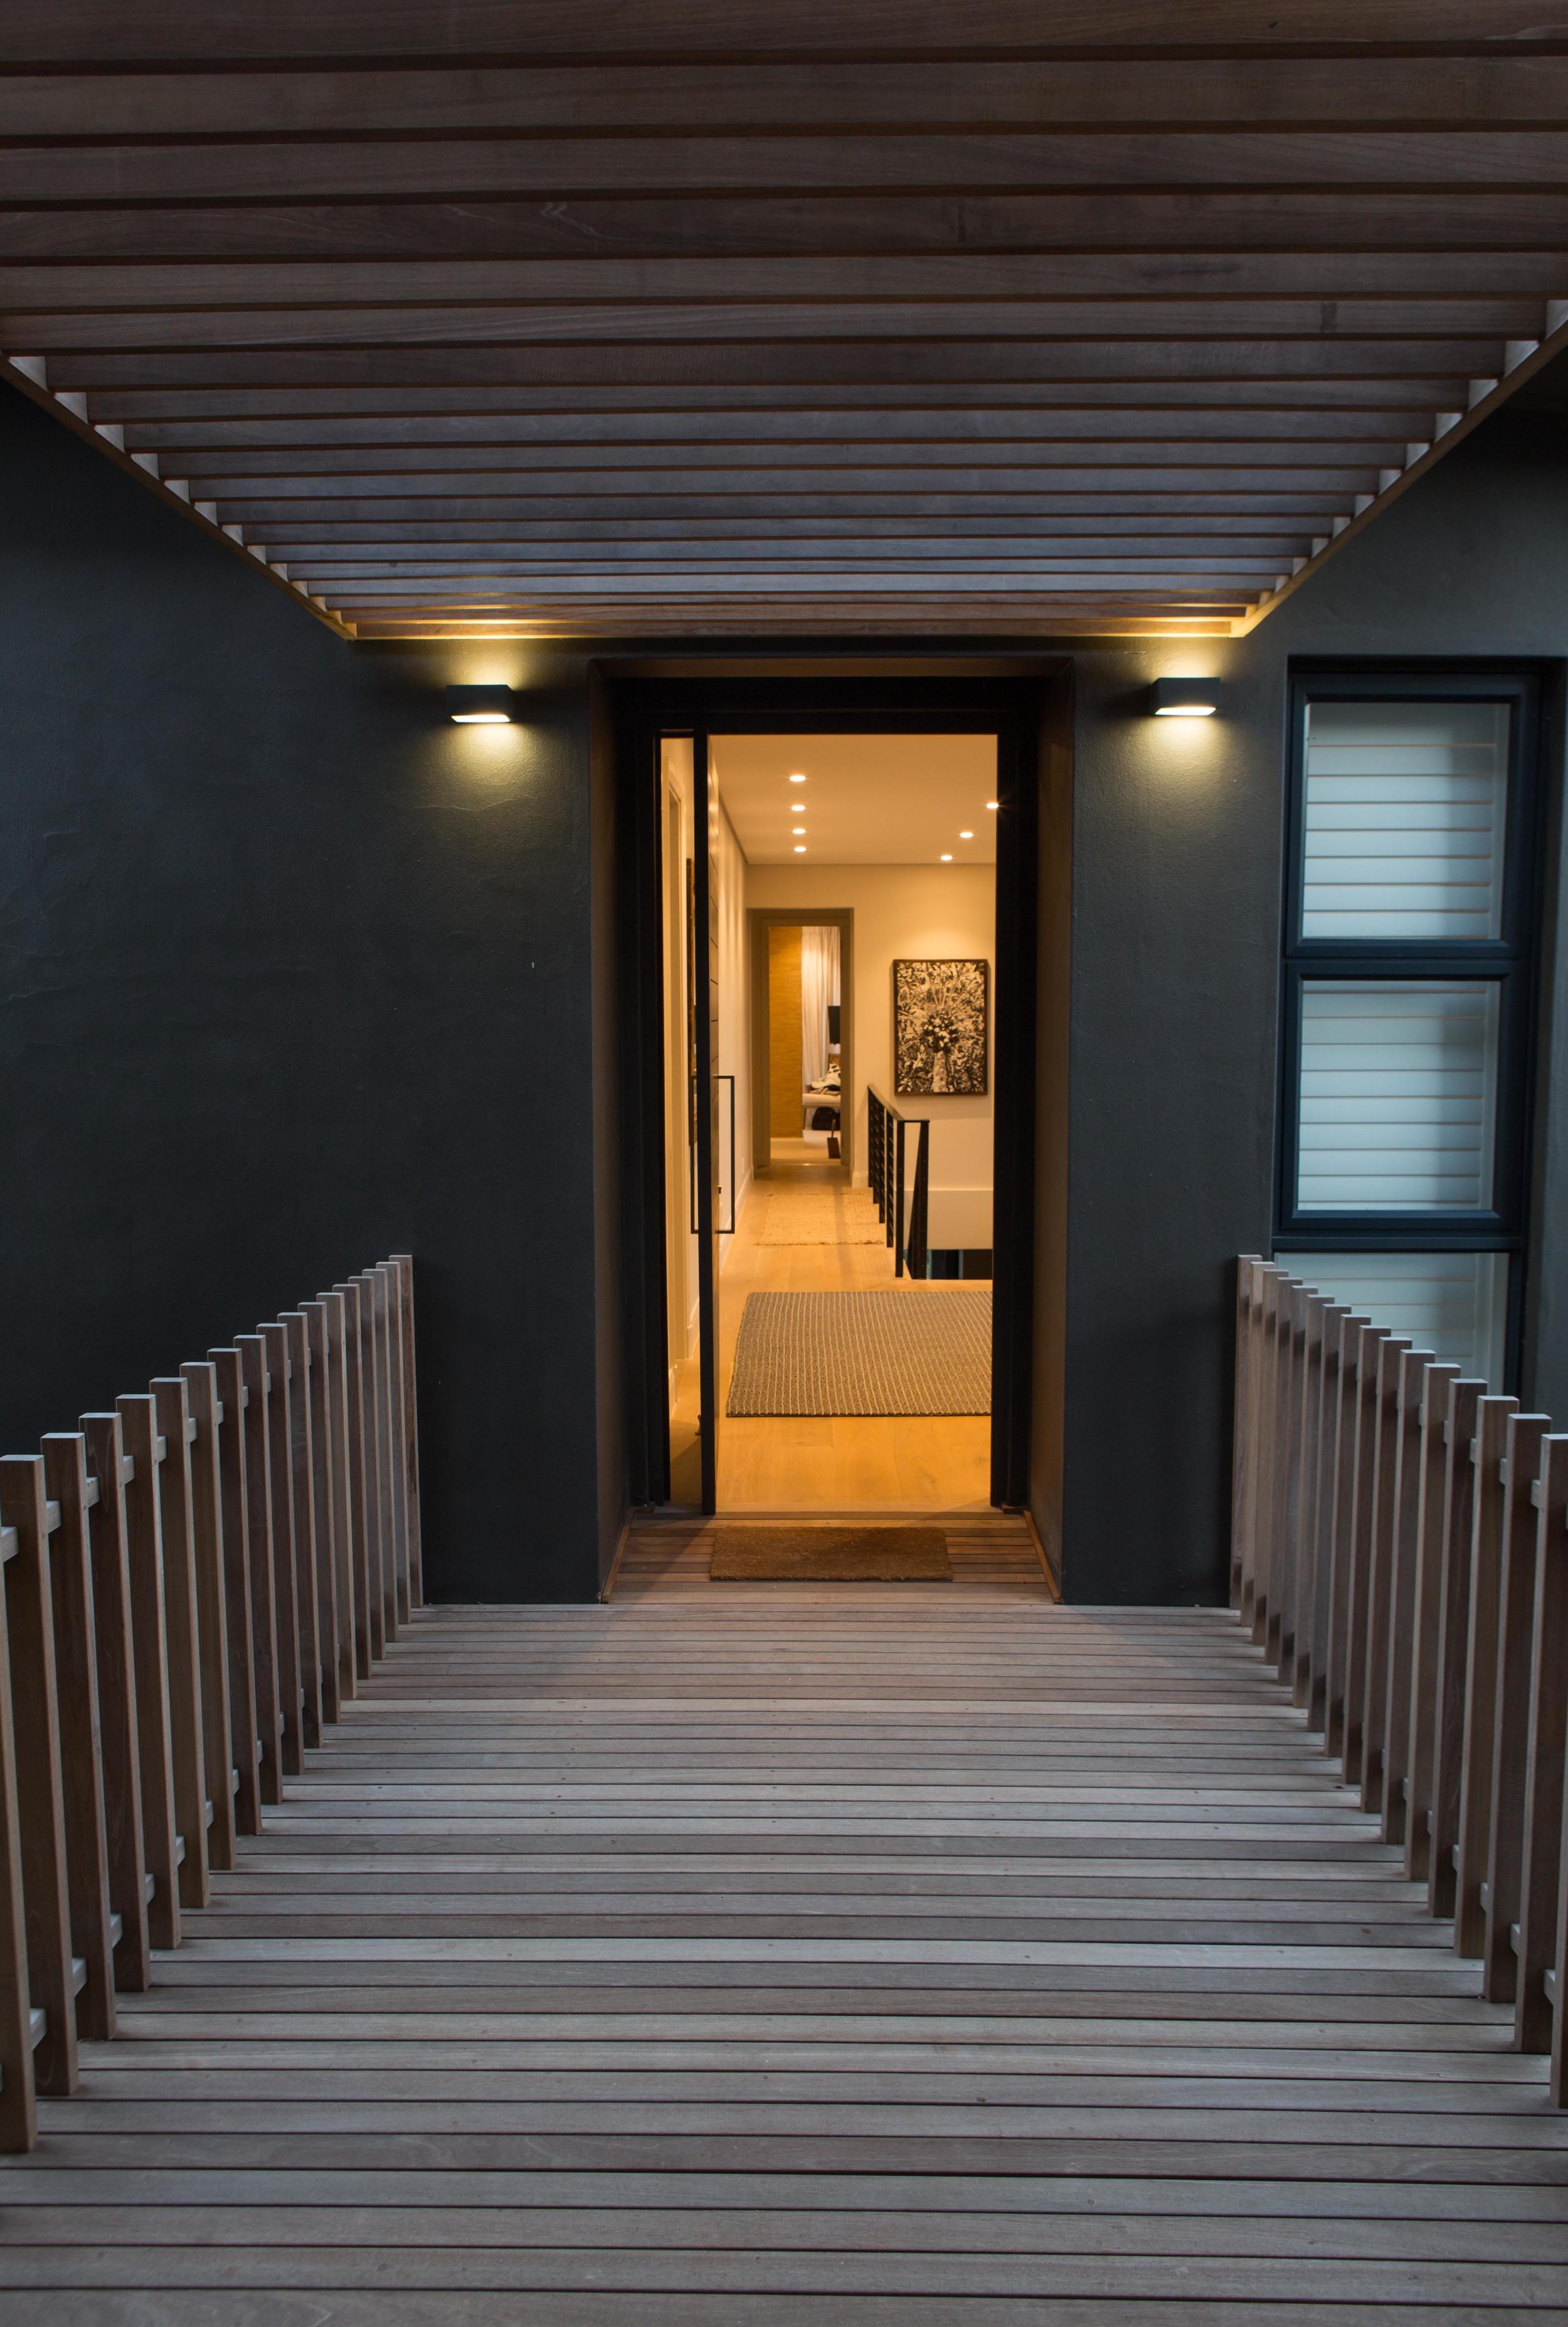 julia-rutherfoord-architect-dunkirk-estate-2015-05.jpg